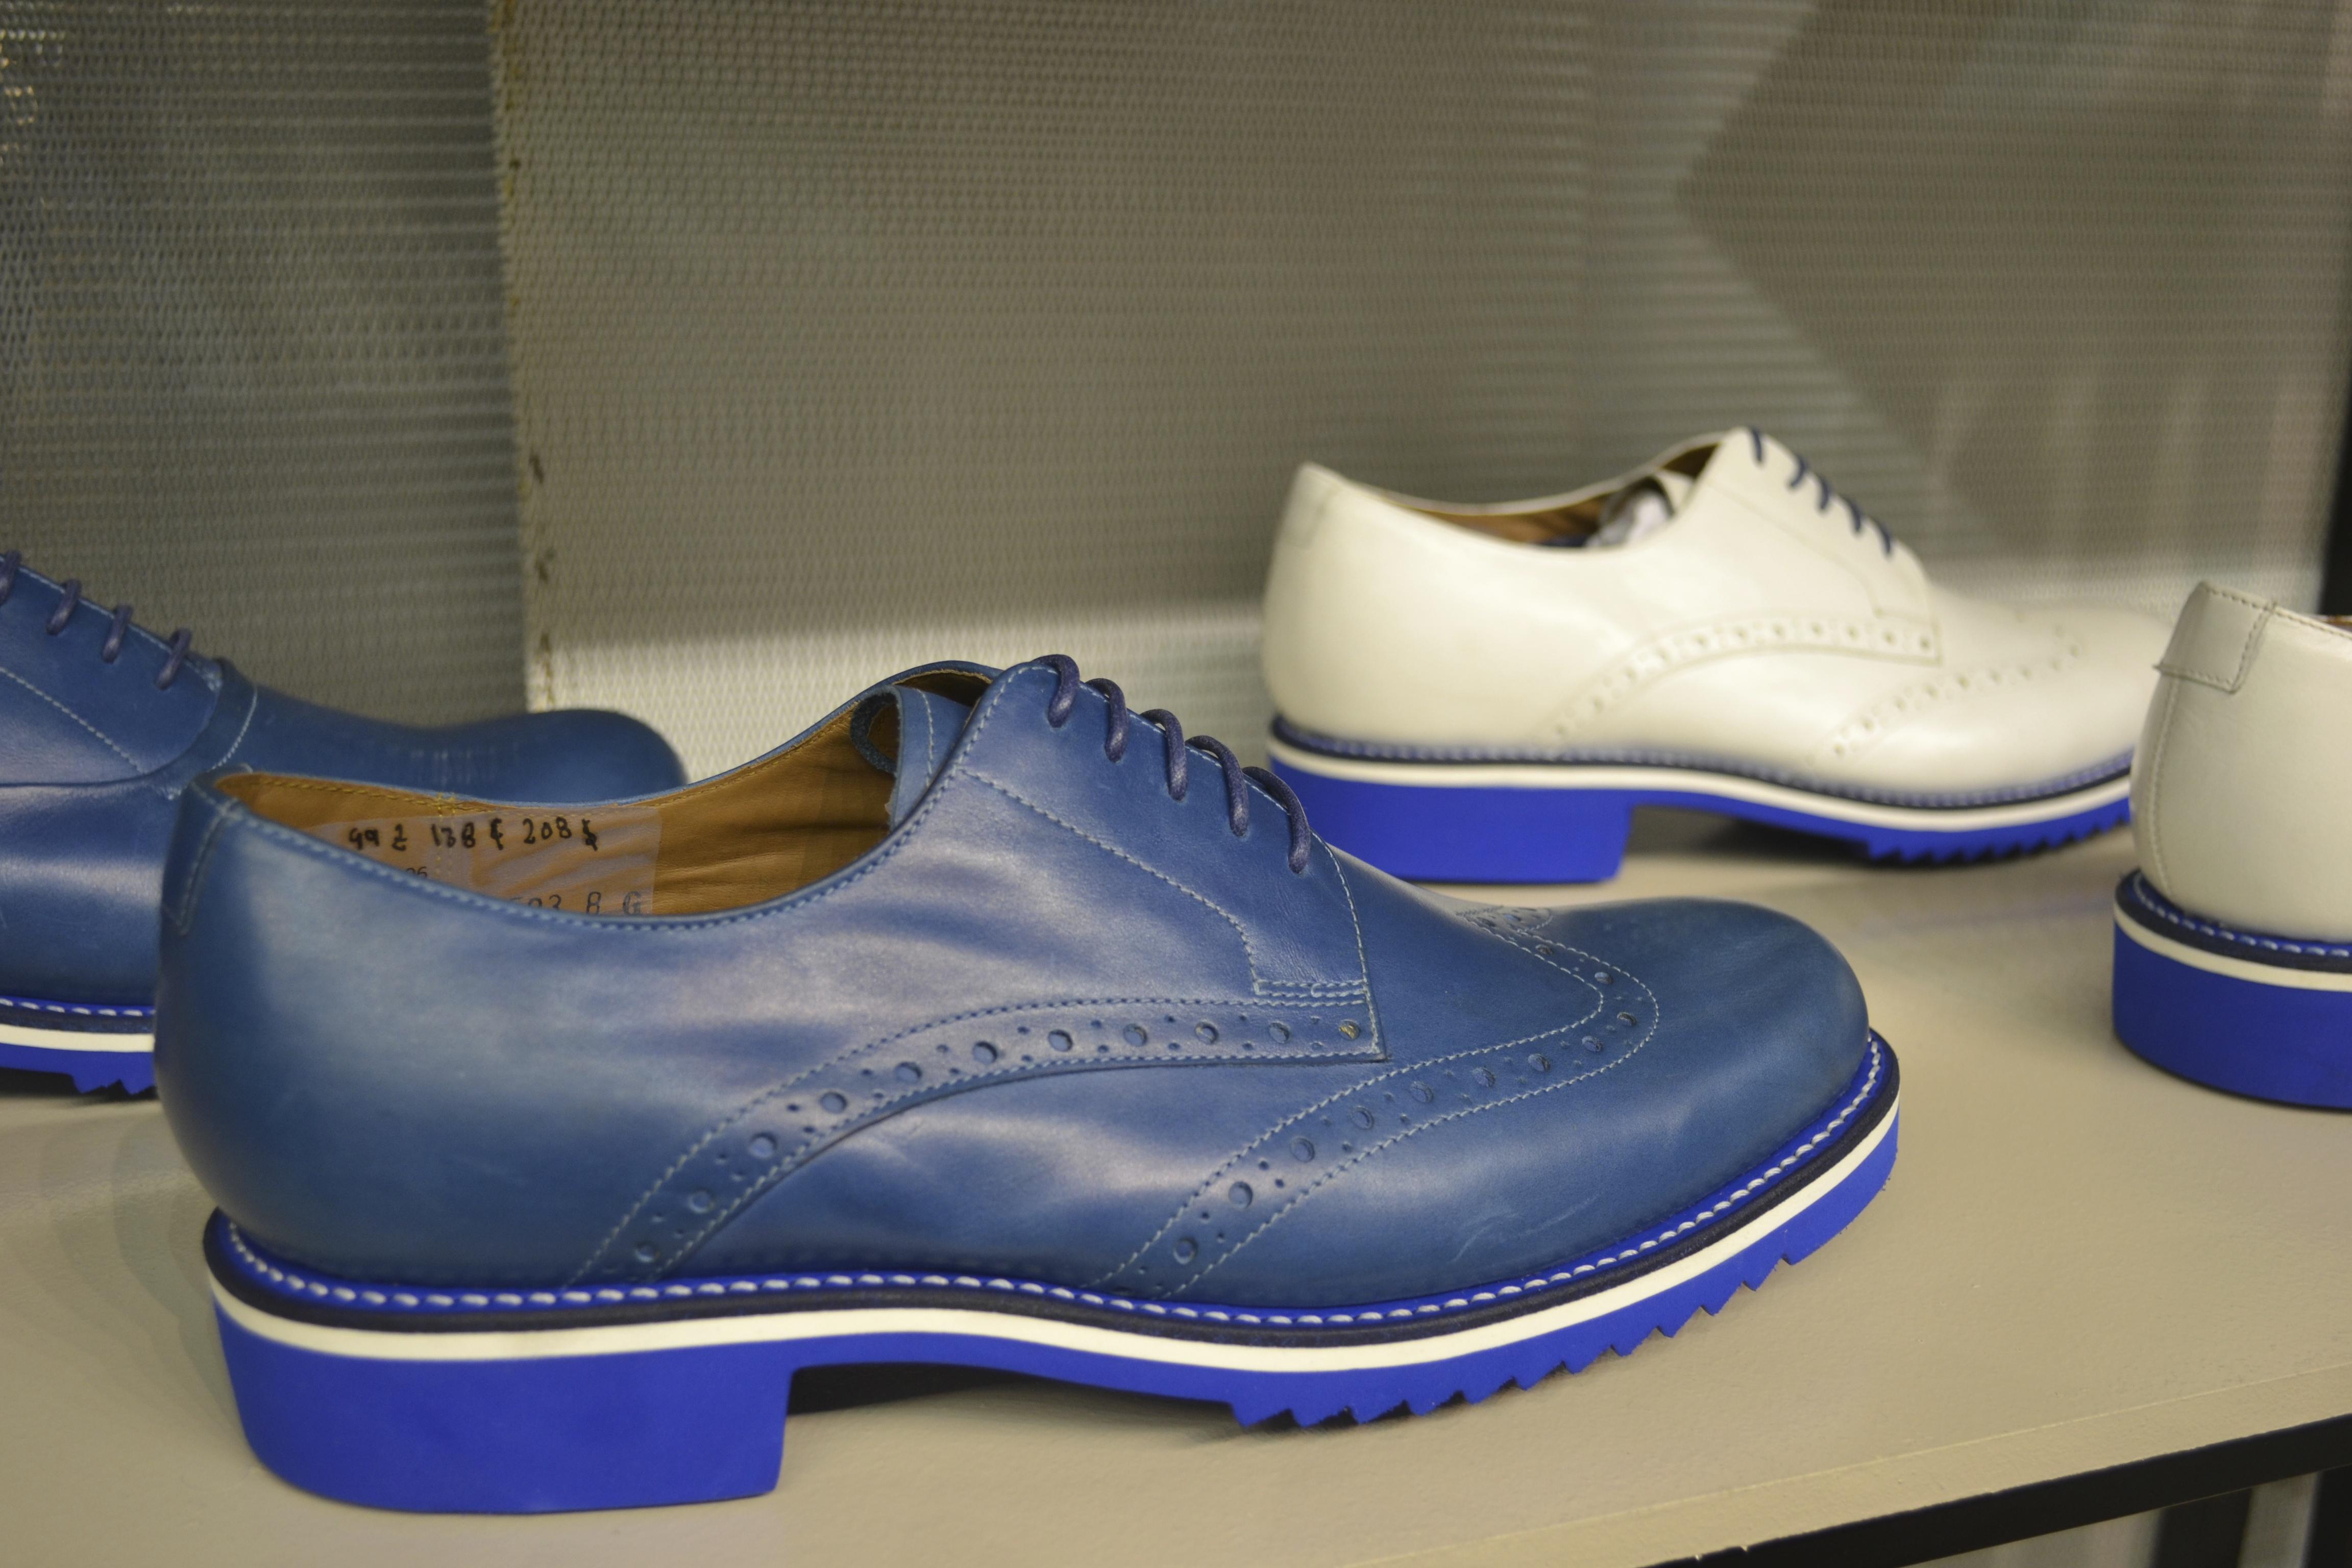 Grenson Footwear S/S 14 at Pitti Uomo 84